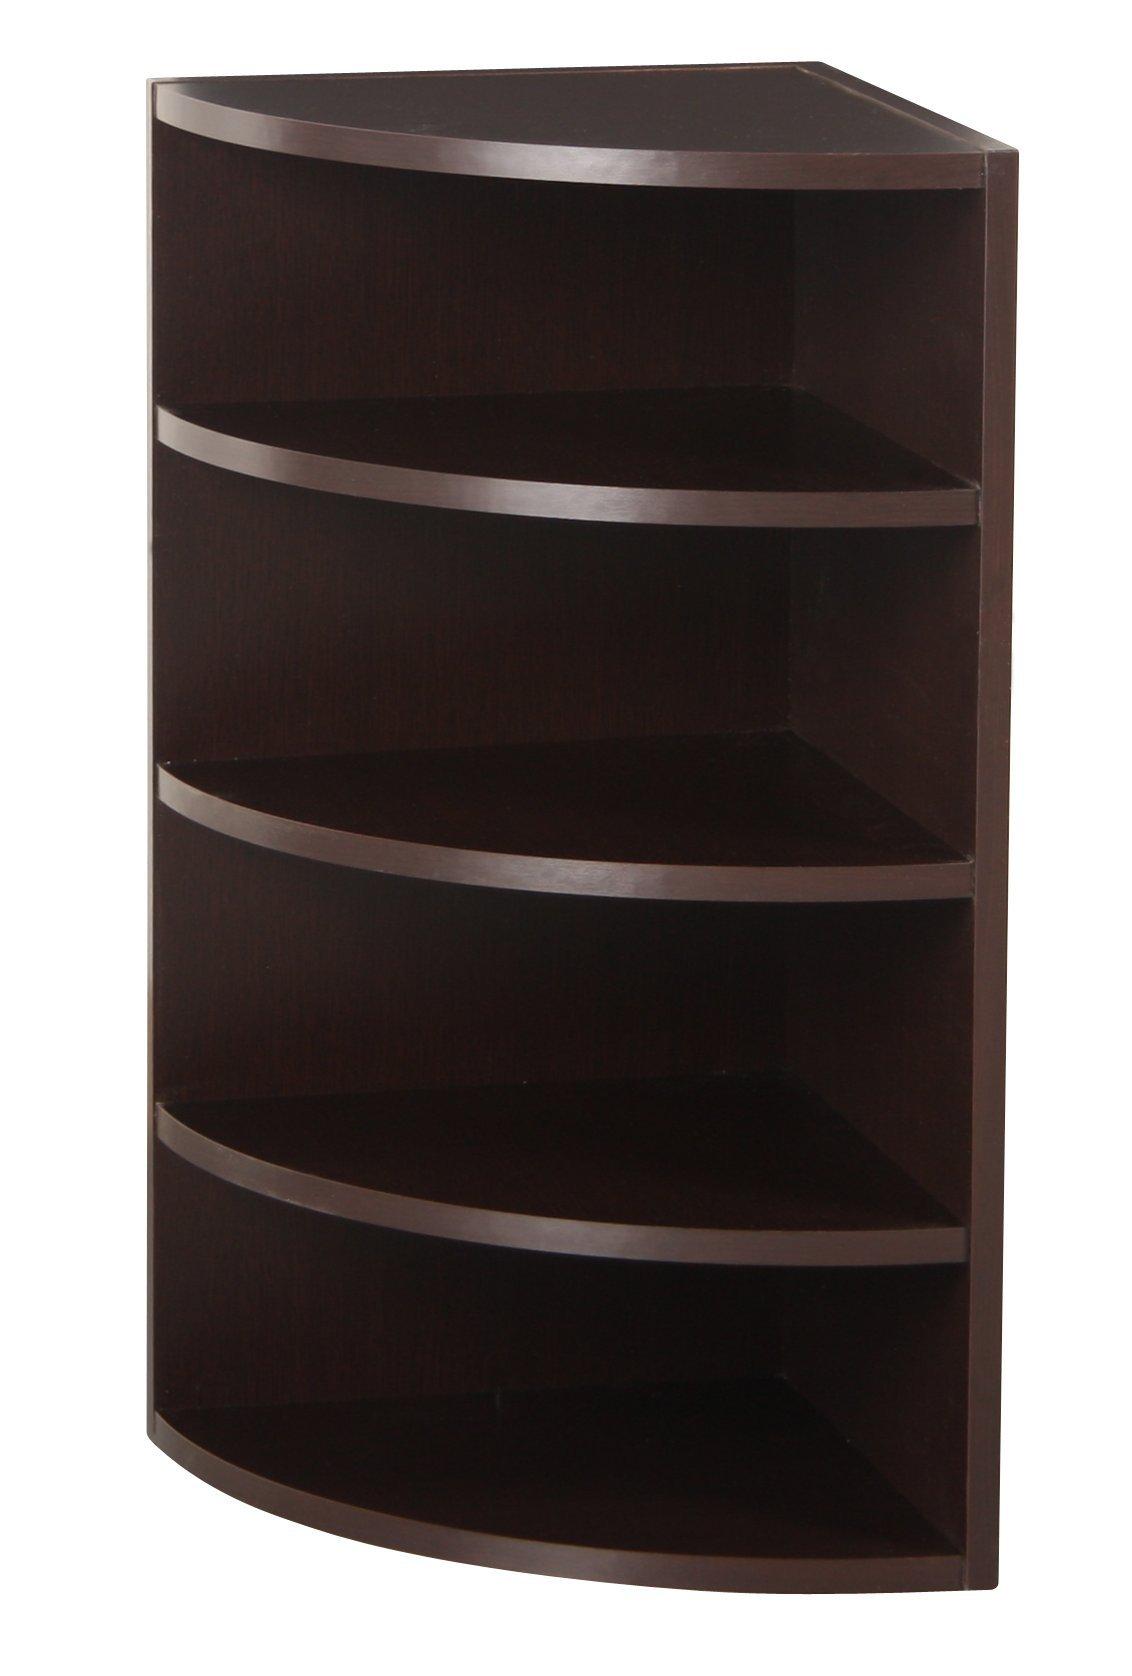 Foremost 328009 Modular Corner Radius Cube Storage System Espresso